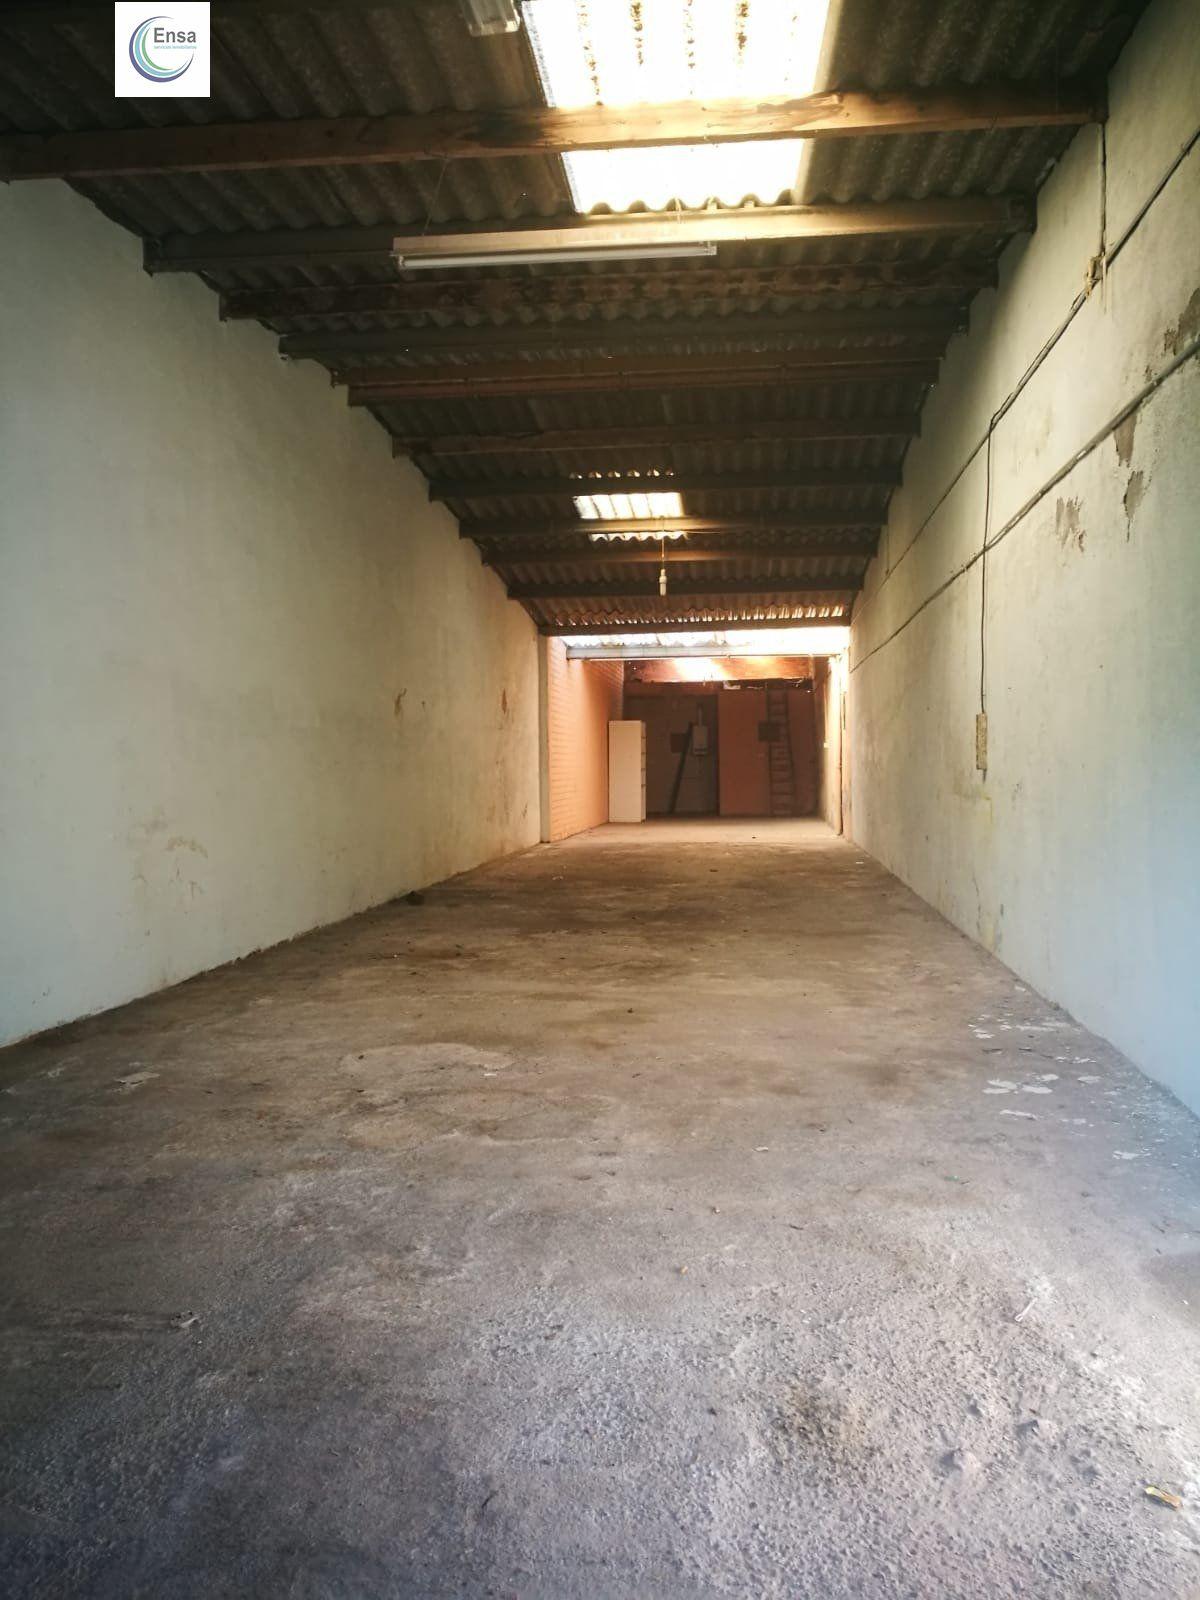 Lloguer Nau industrial  Vila-real ,cami de la carretera. Nave 120m. en alquiler por 350€